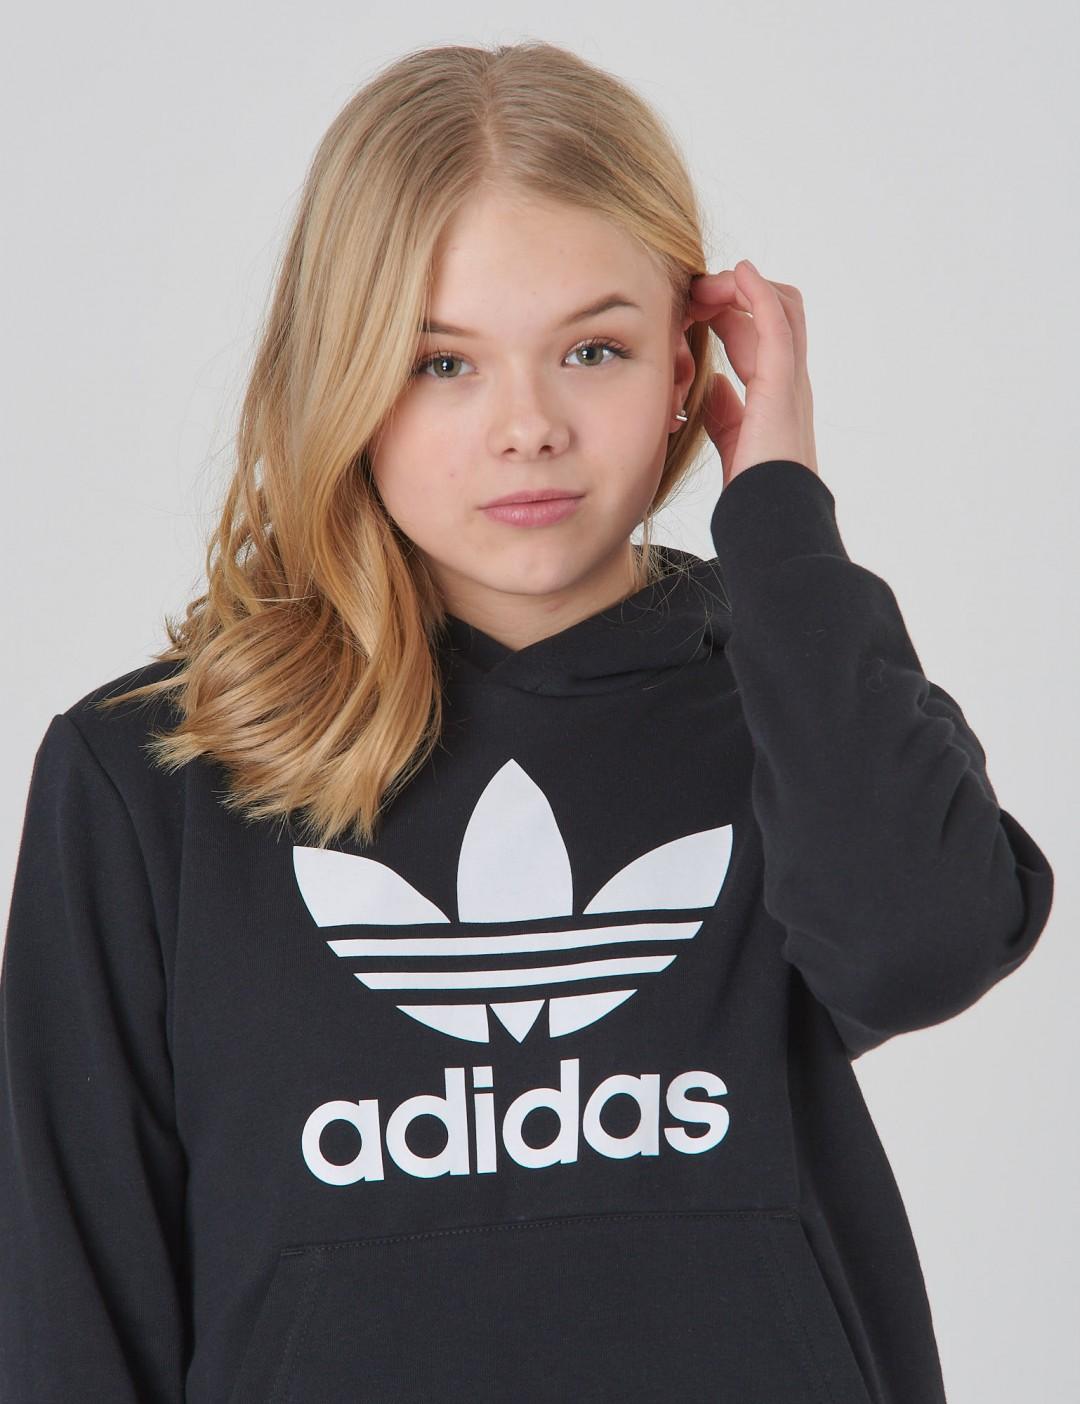 Adidas Originals barnkläder - TREFOIL HOODIE Adidas Originals barnkläder -  TREFOIL HOODIE ... fc456ac084